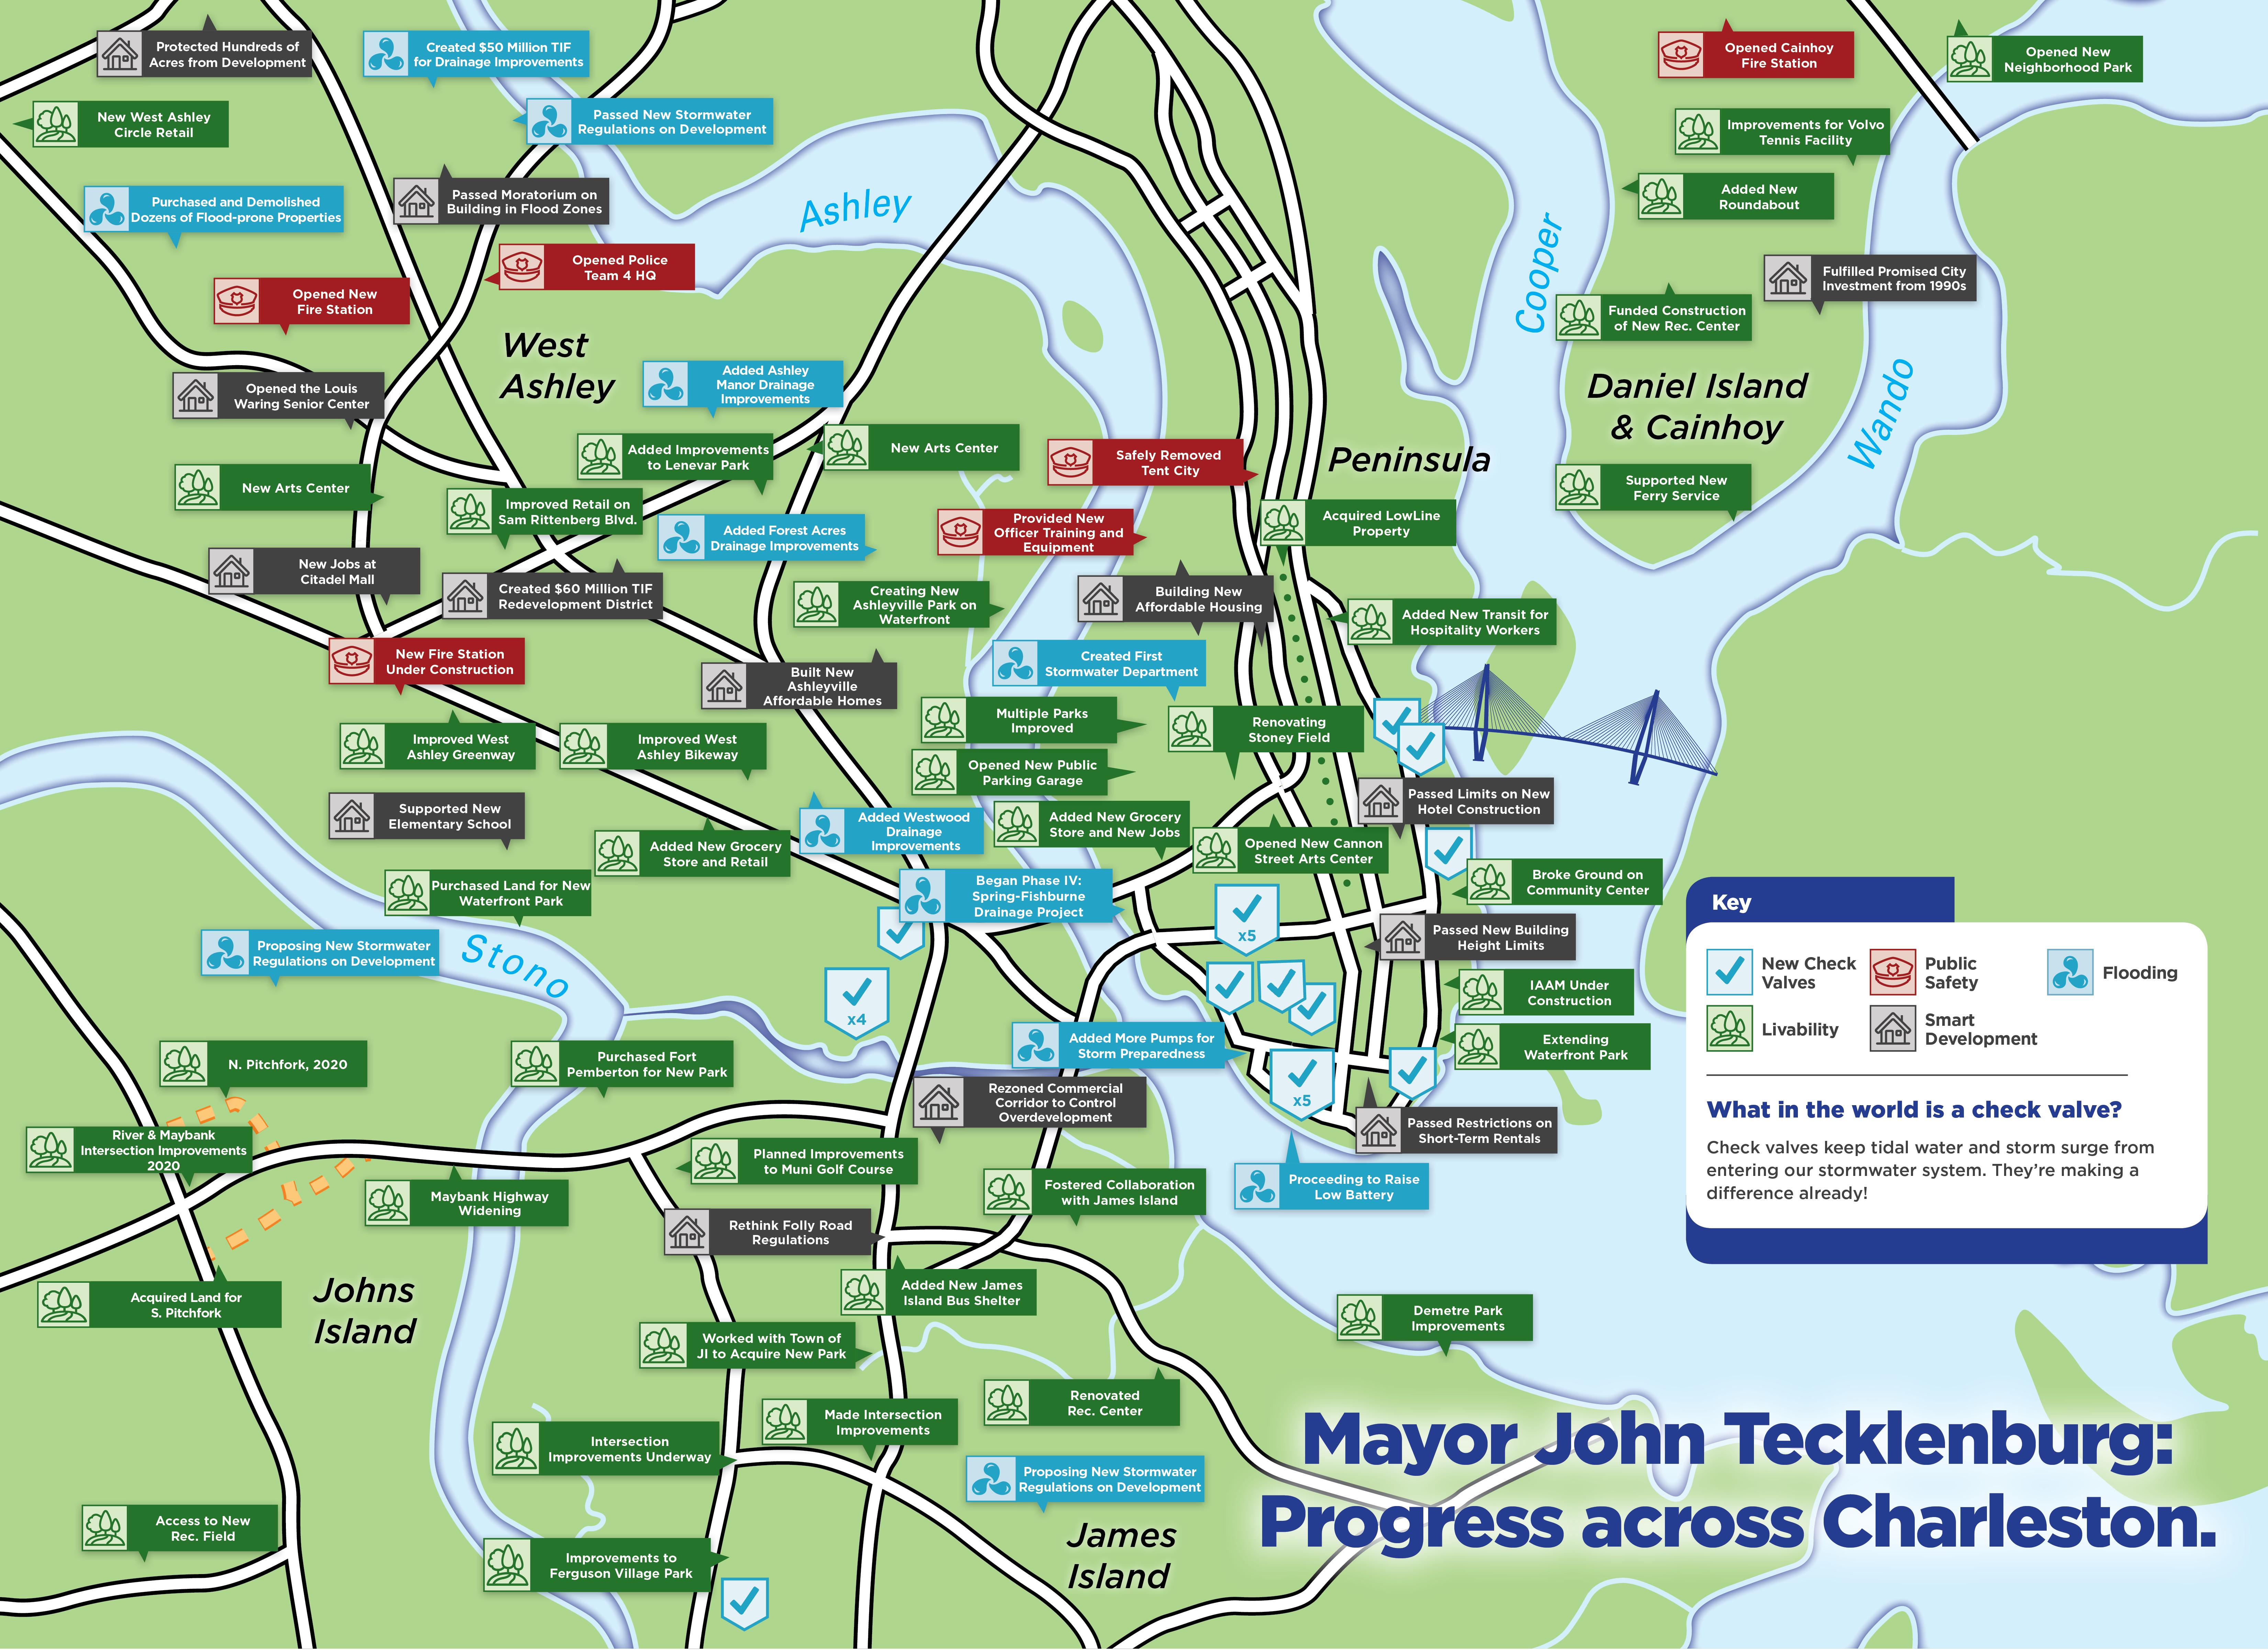 Tecklenburg Accomplishments Map